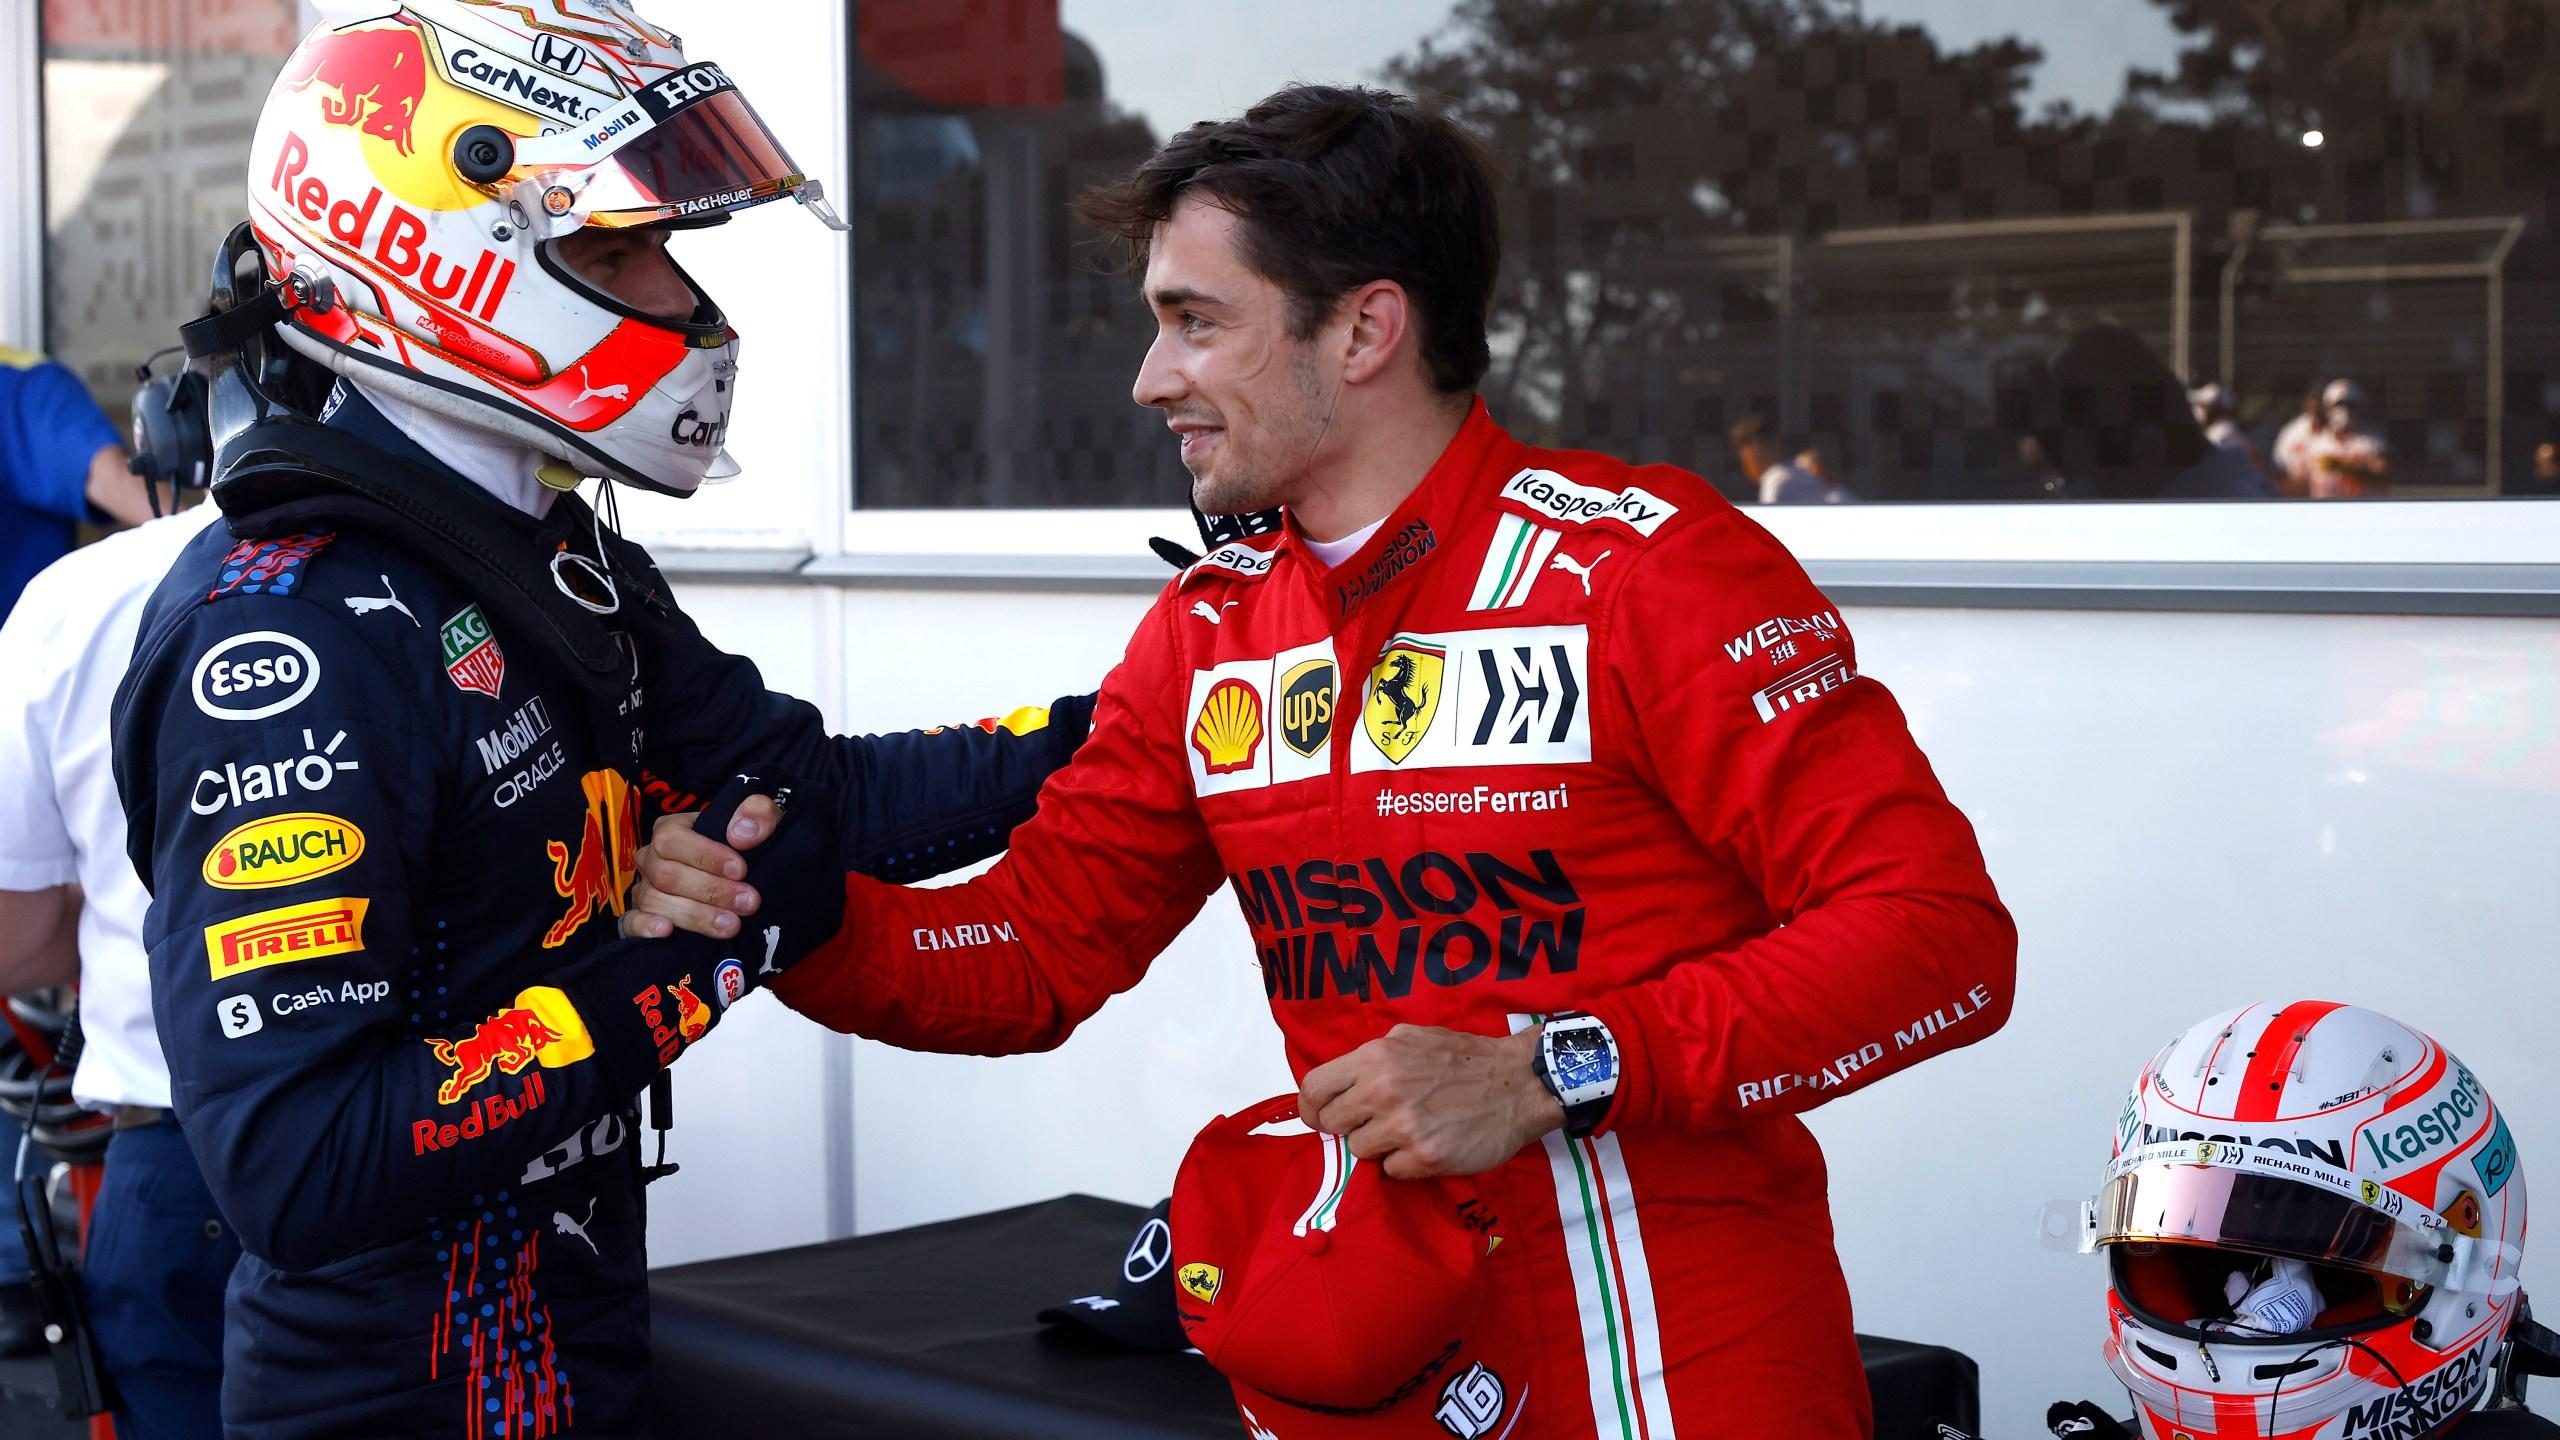 F1 Grand Prix of Azerbaijan - Previews